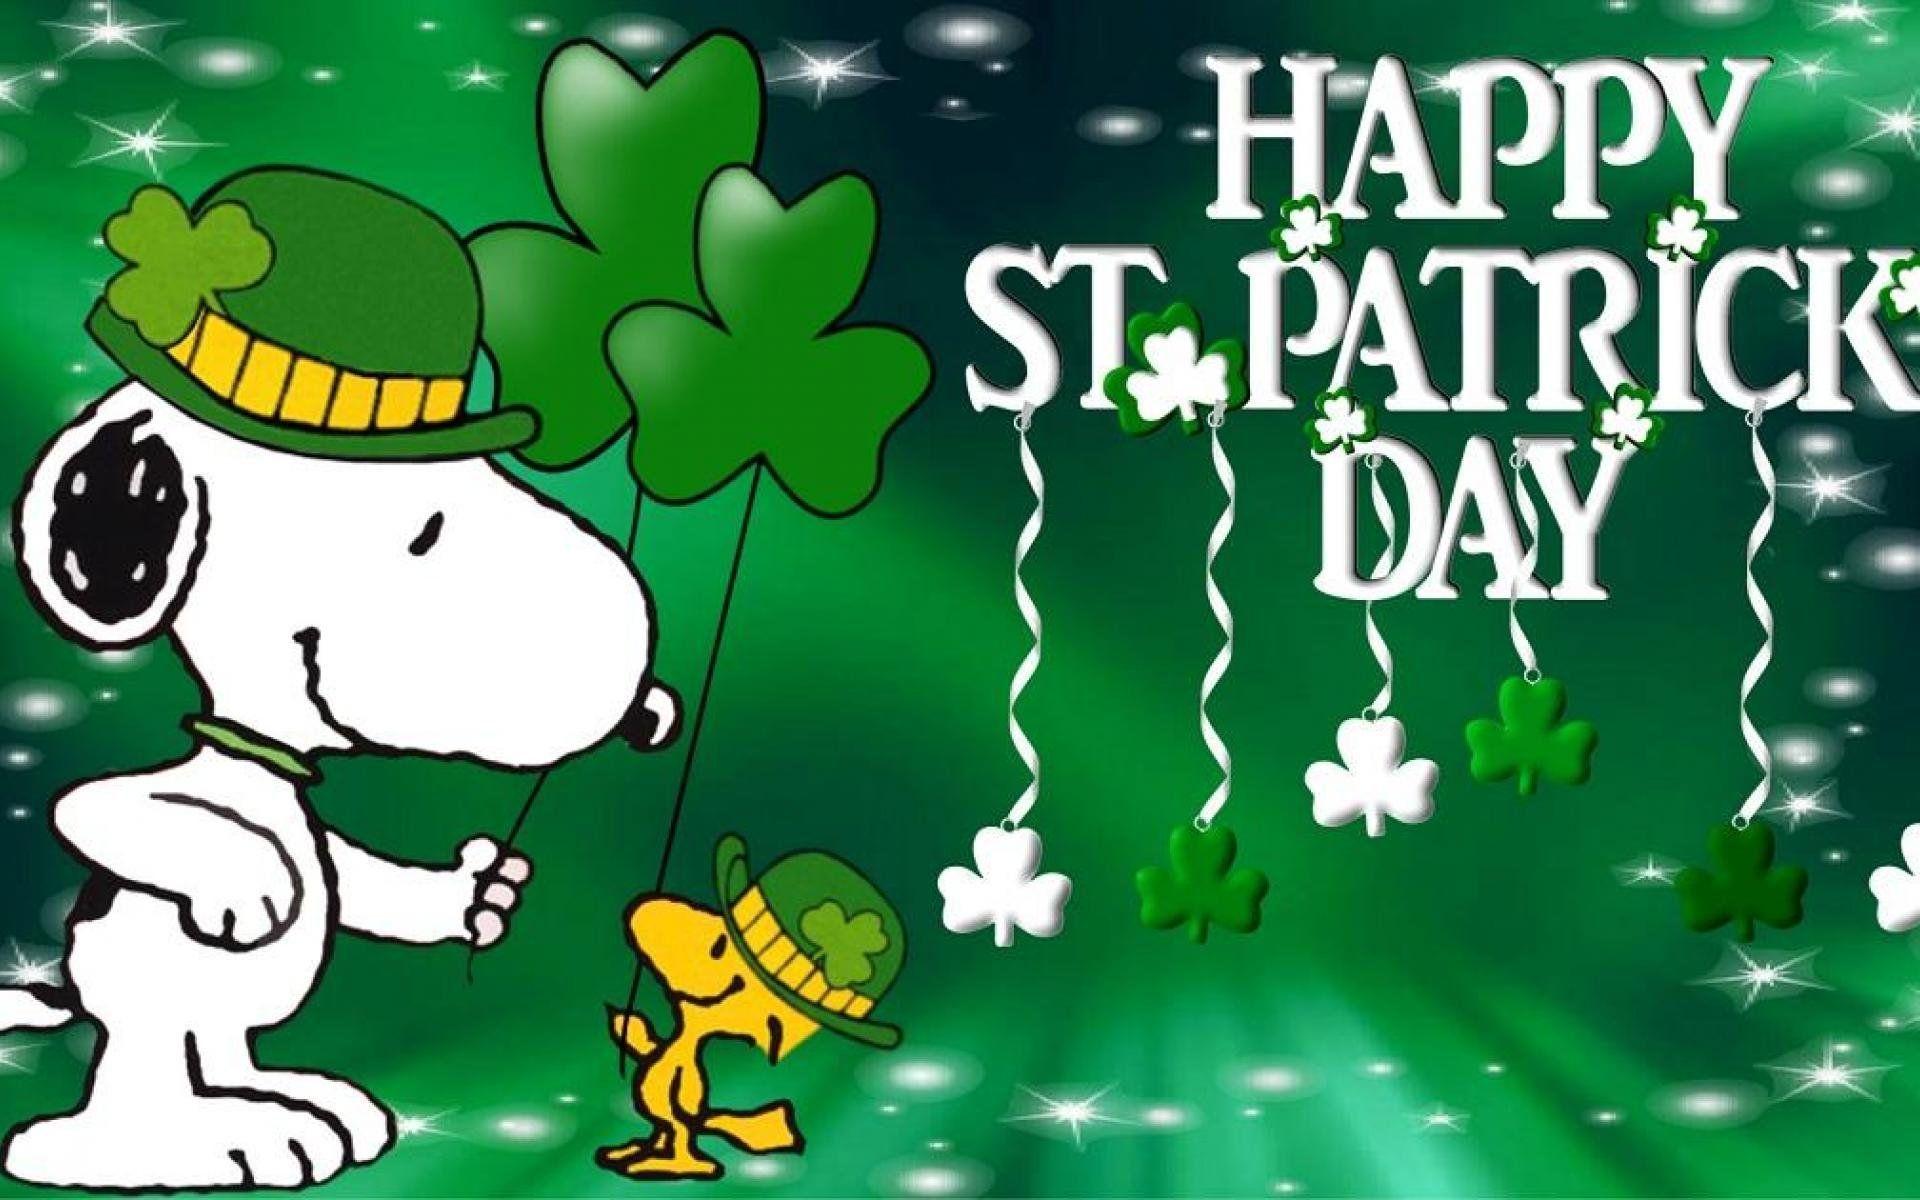 St. Patricks Day Meme Wallpapers - Wallpaper Cave